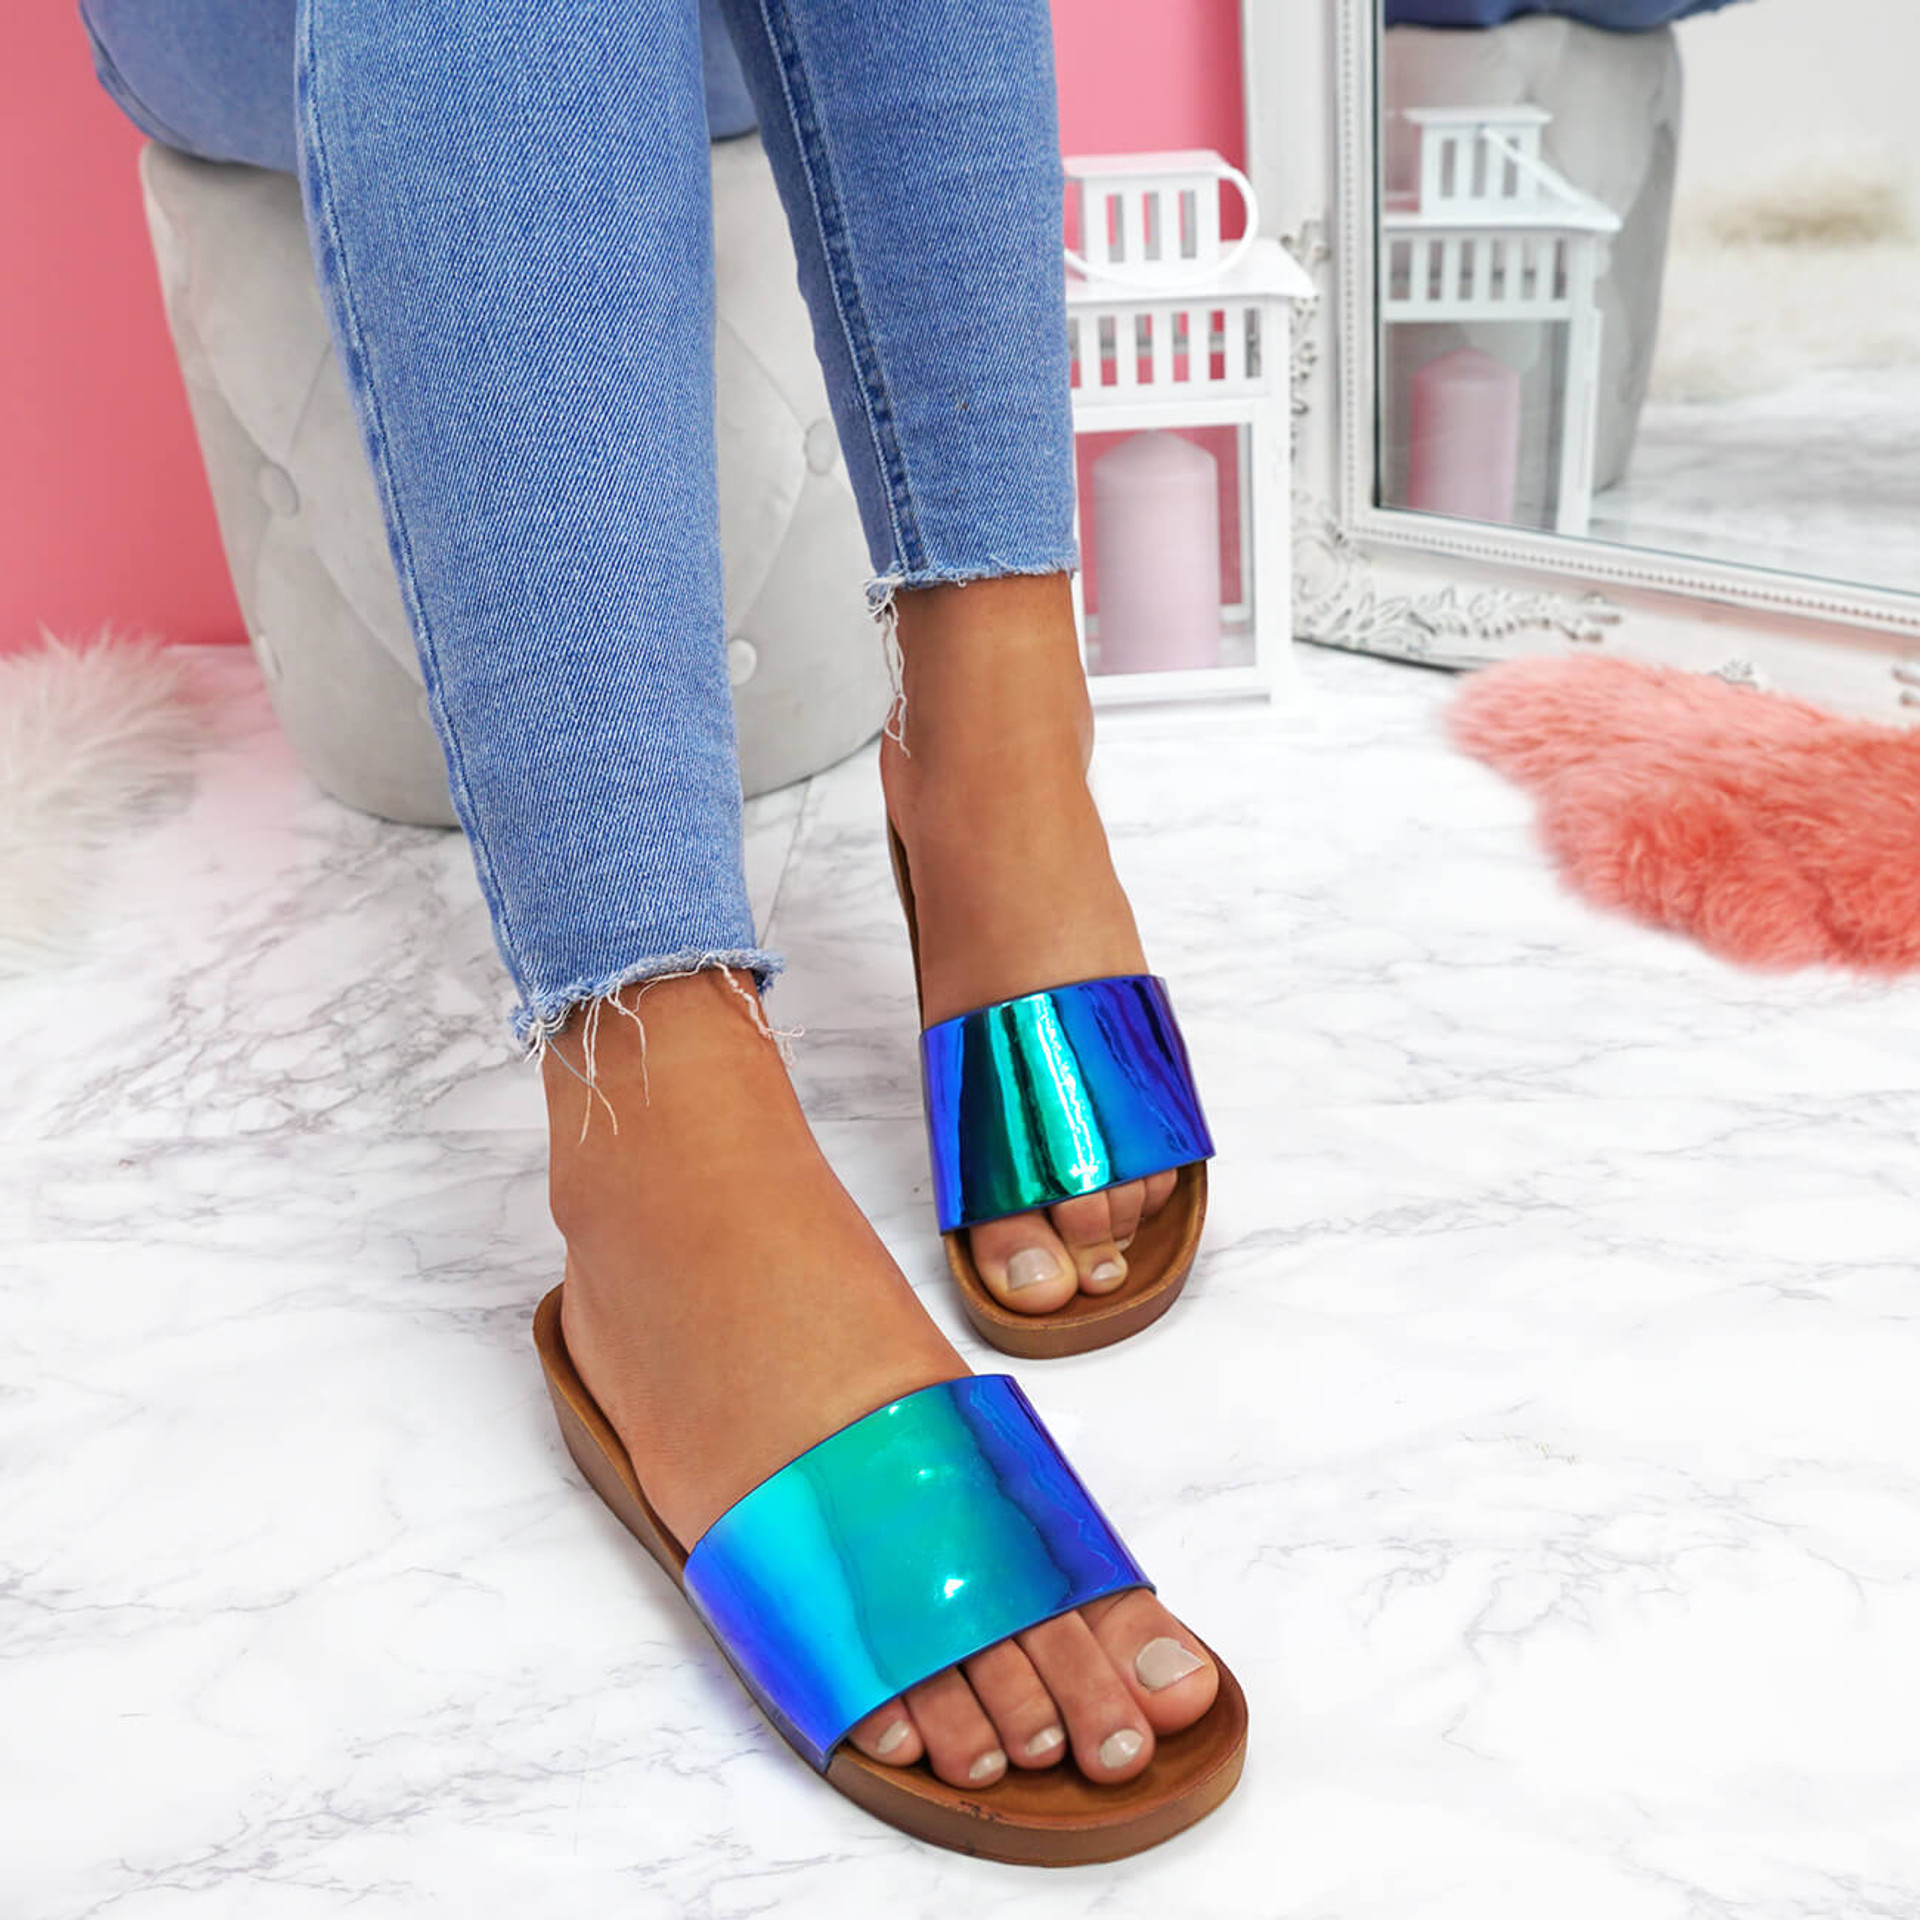 womens ladies slip on metallic patent heels party shoes women sliders size uk 3 4 5 6 7 8